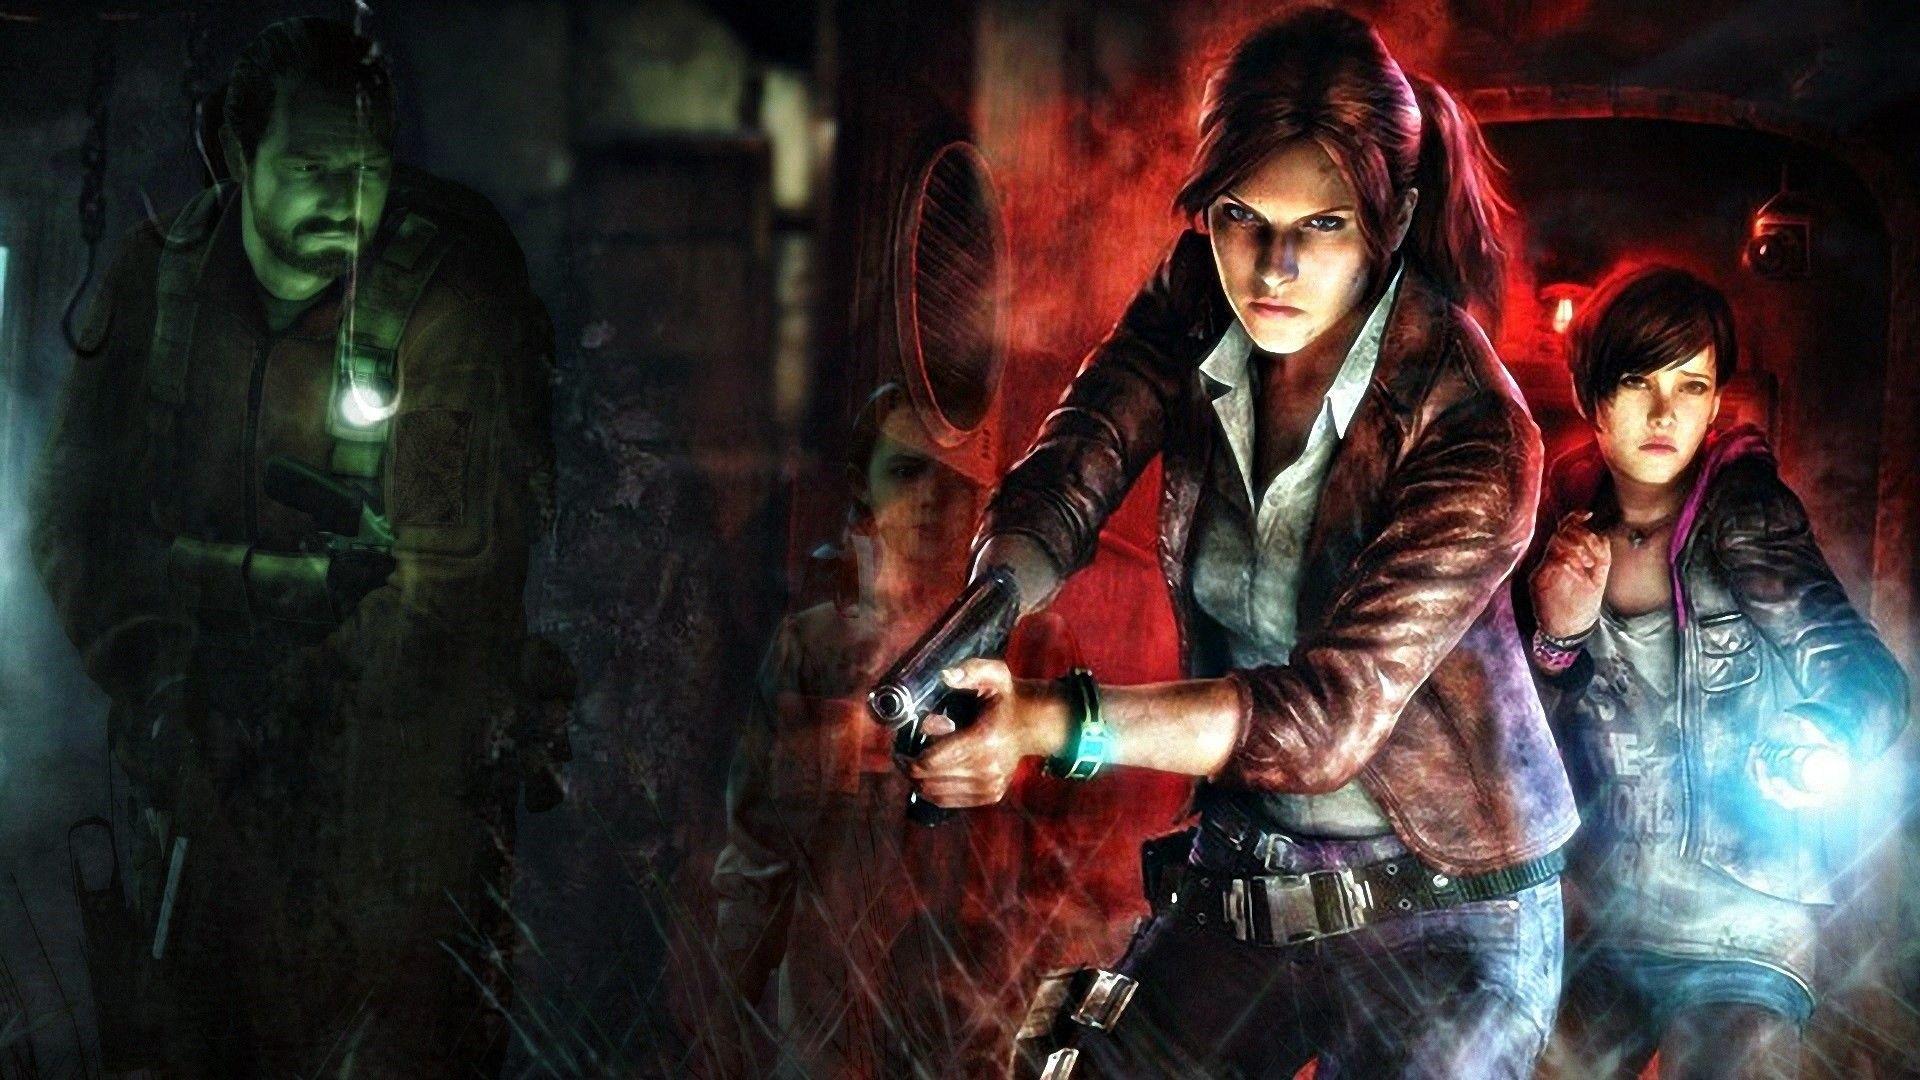 Download 880 Wallpaper Pubg Resident Evil Paling Keren